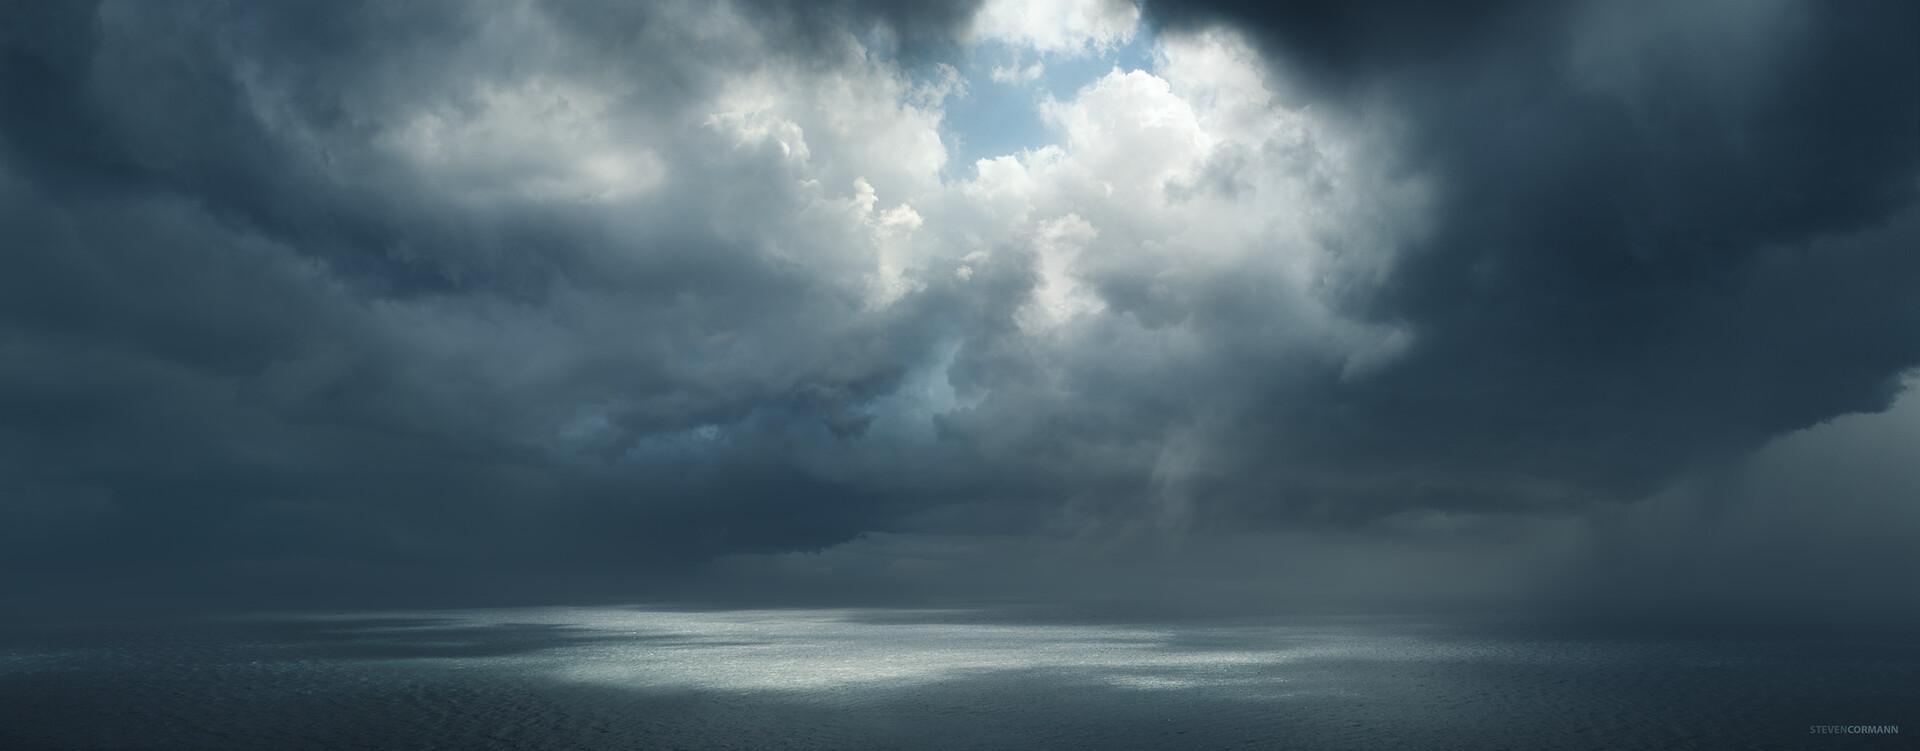 Steven cormann storms